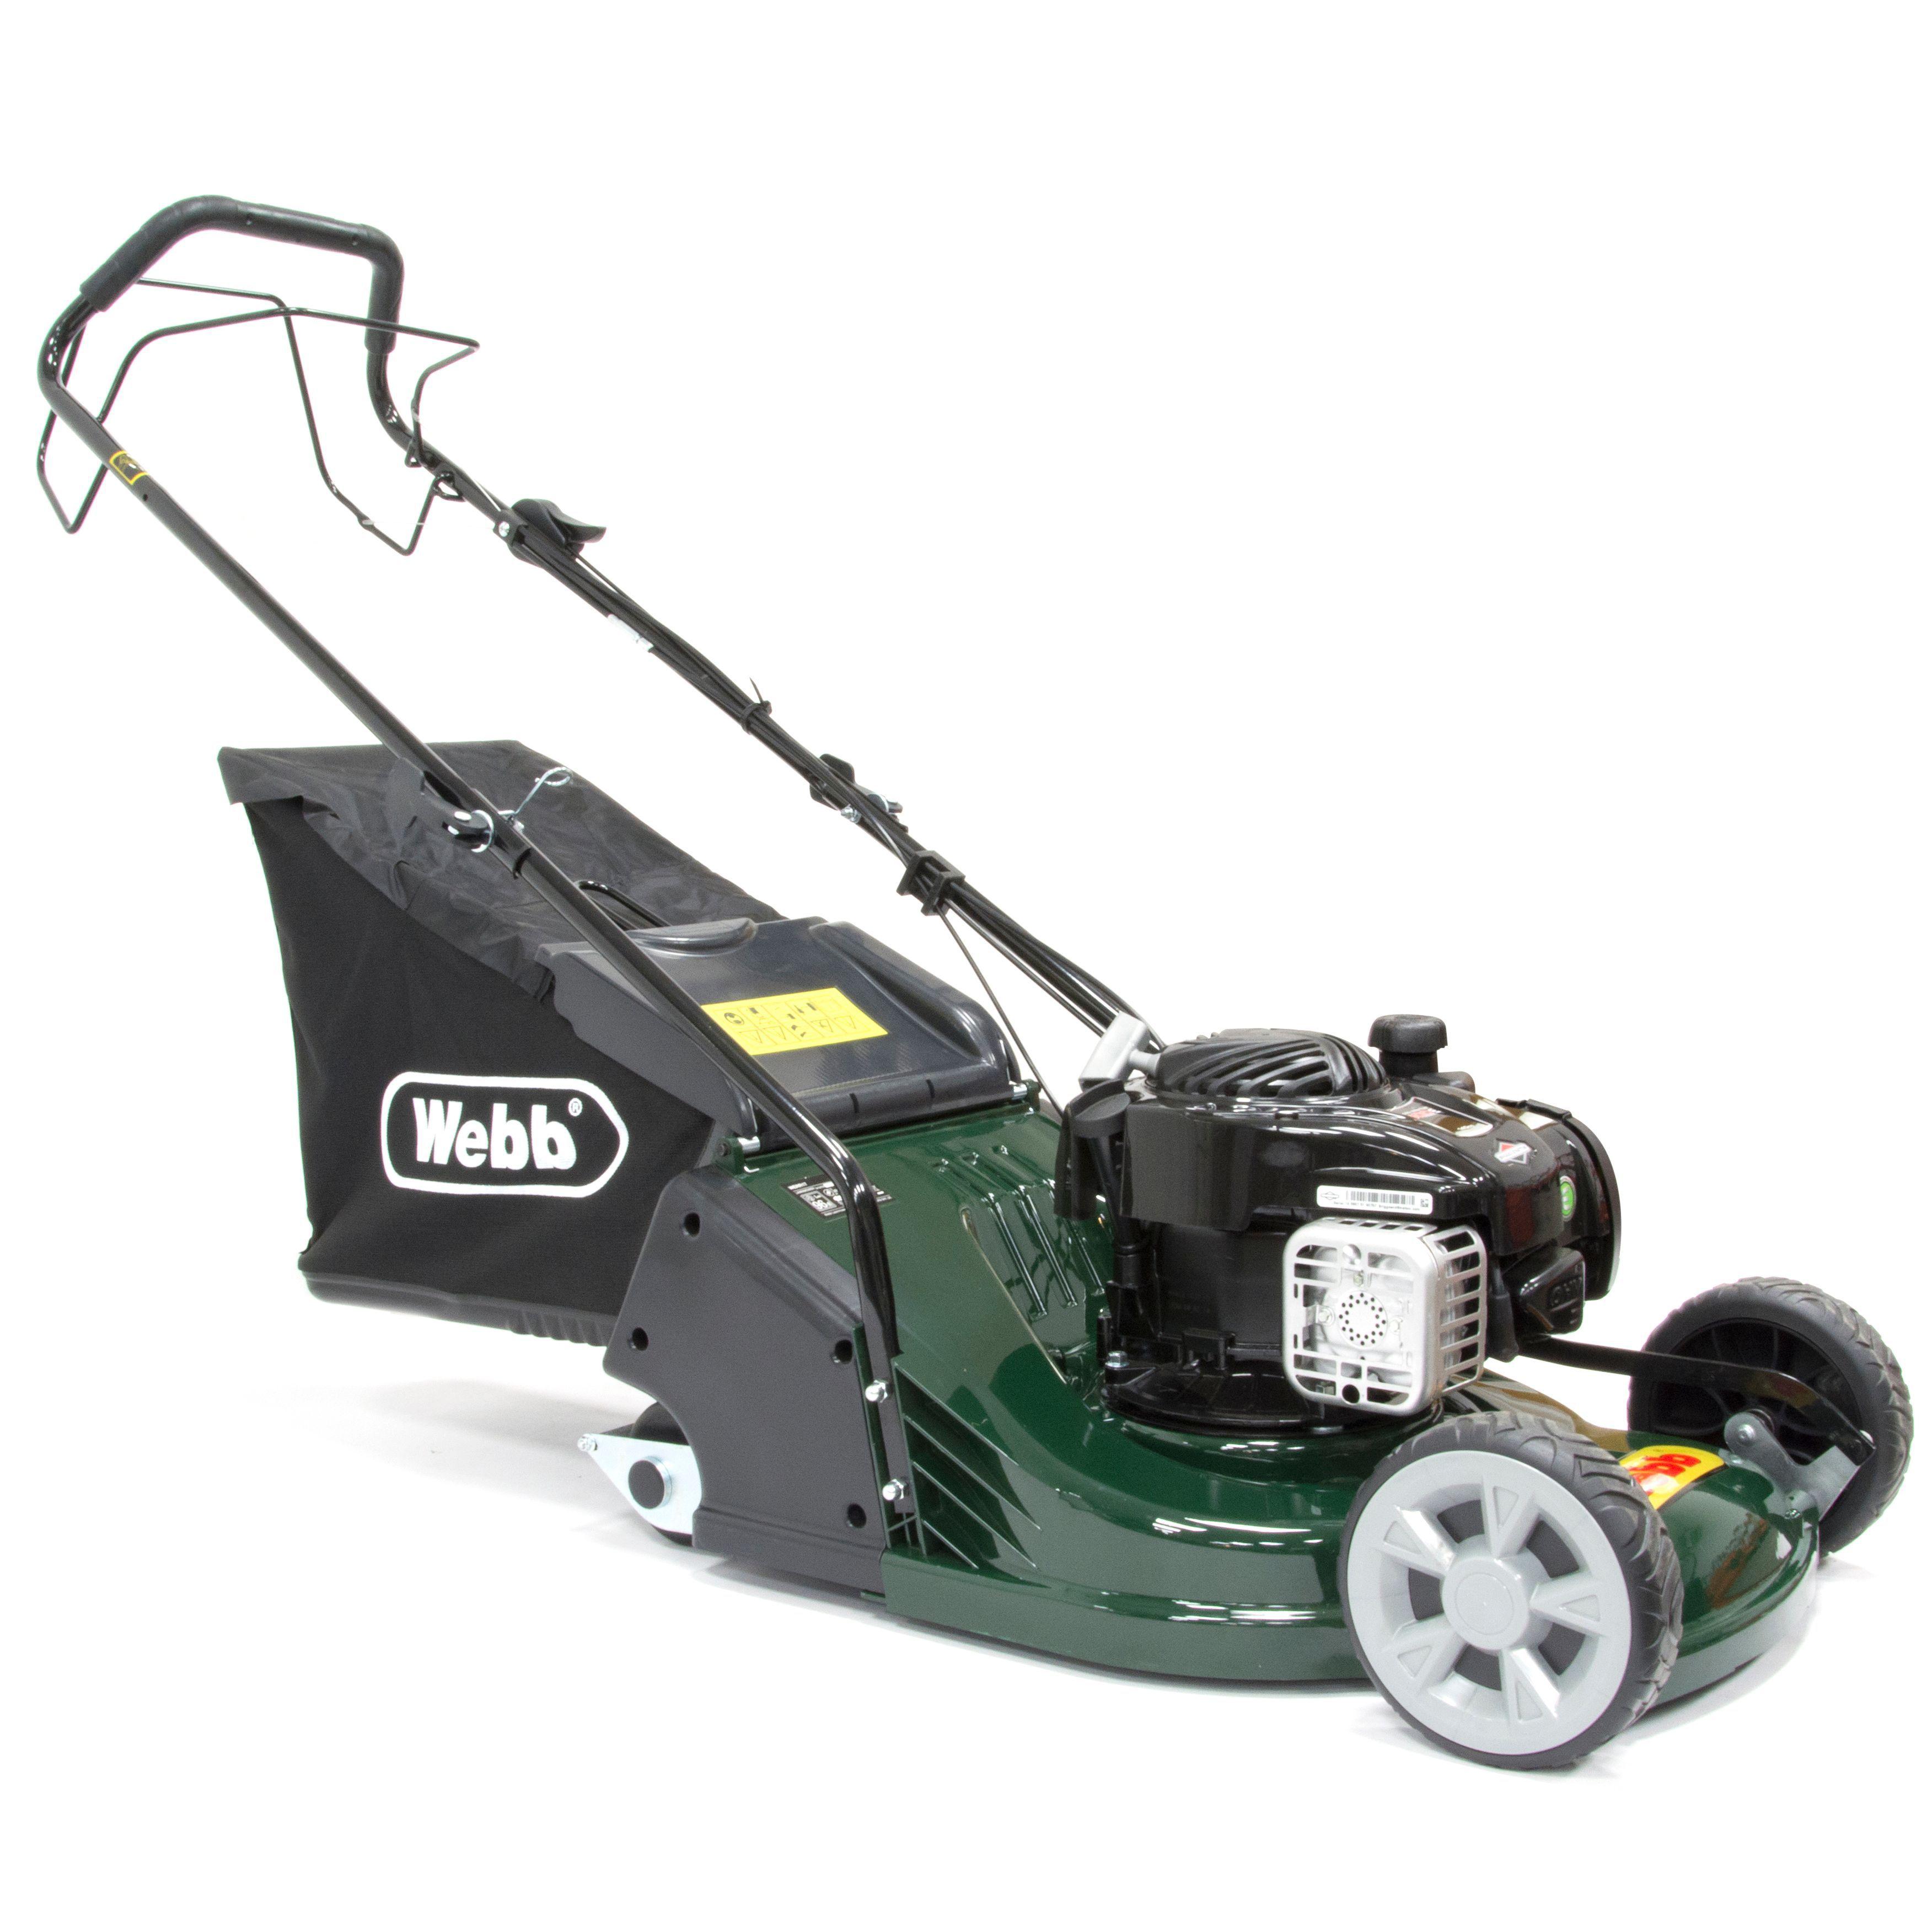 Webb Rr17sp Petrol Lawnmower Departments Diy At B Amp Q